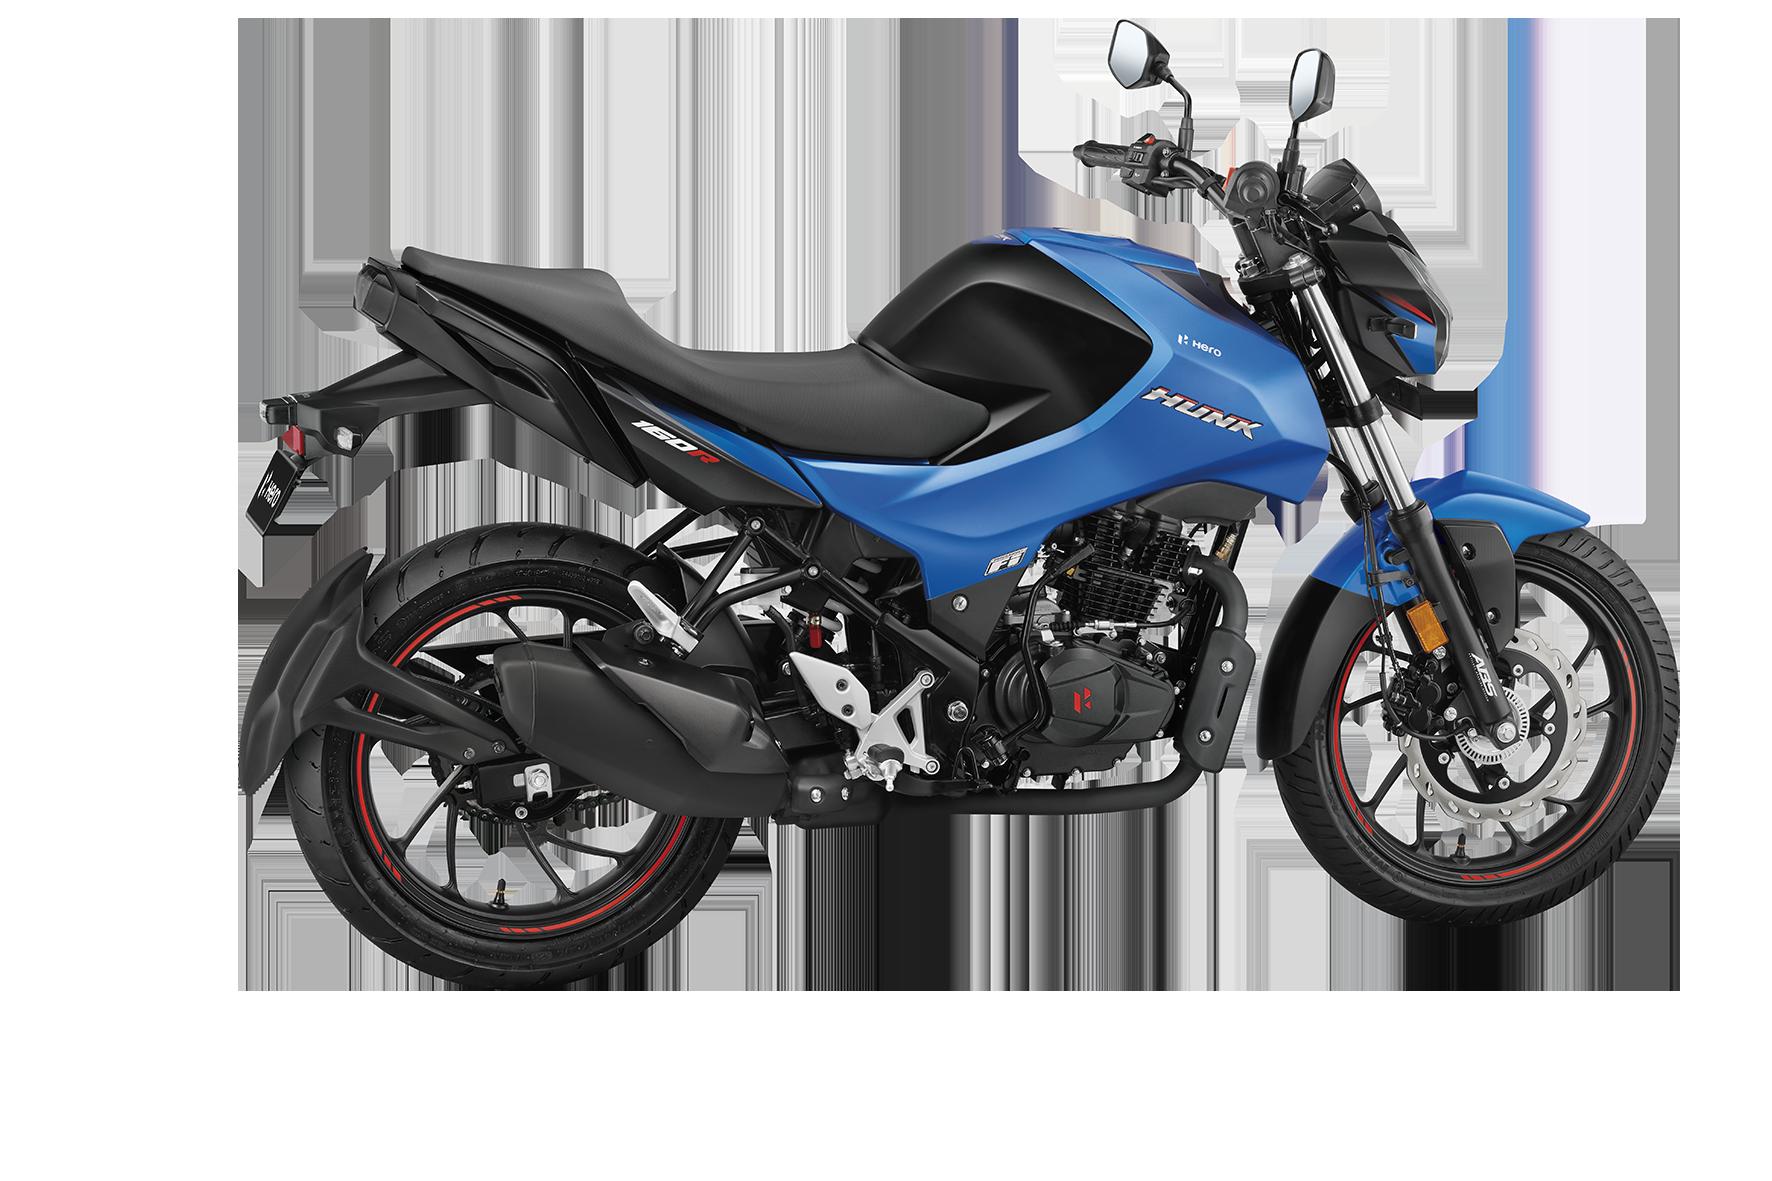 MOTOCICLETA HUNK 160R 2021